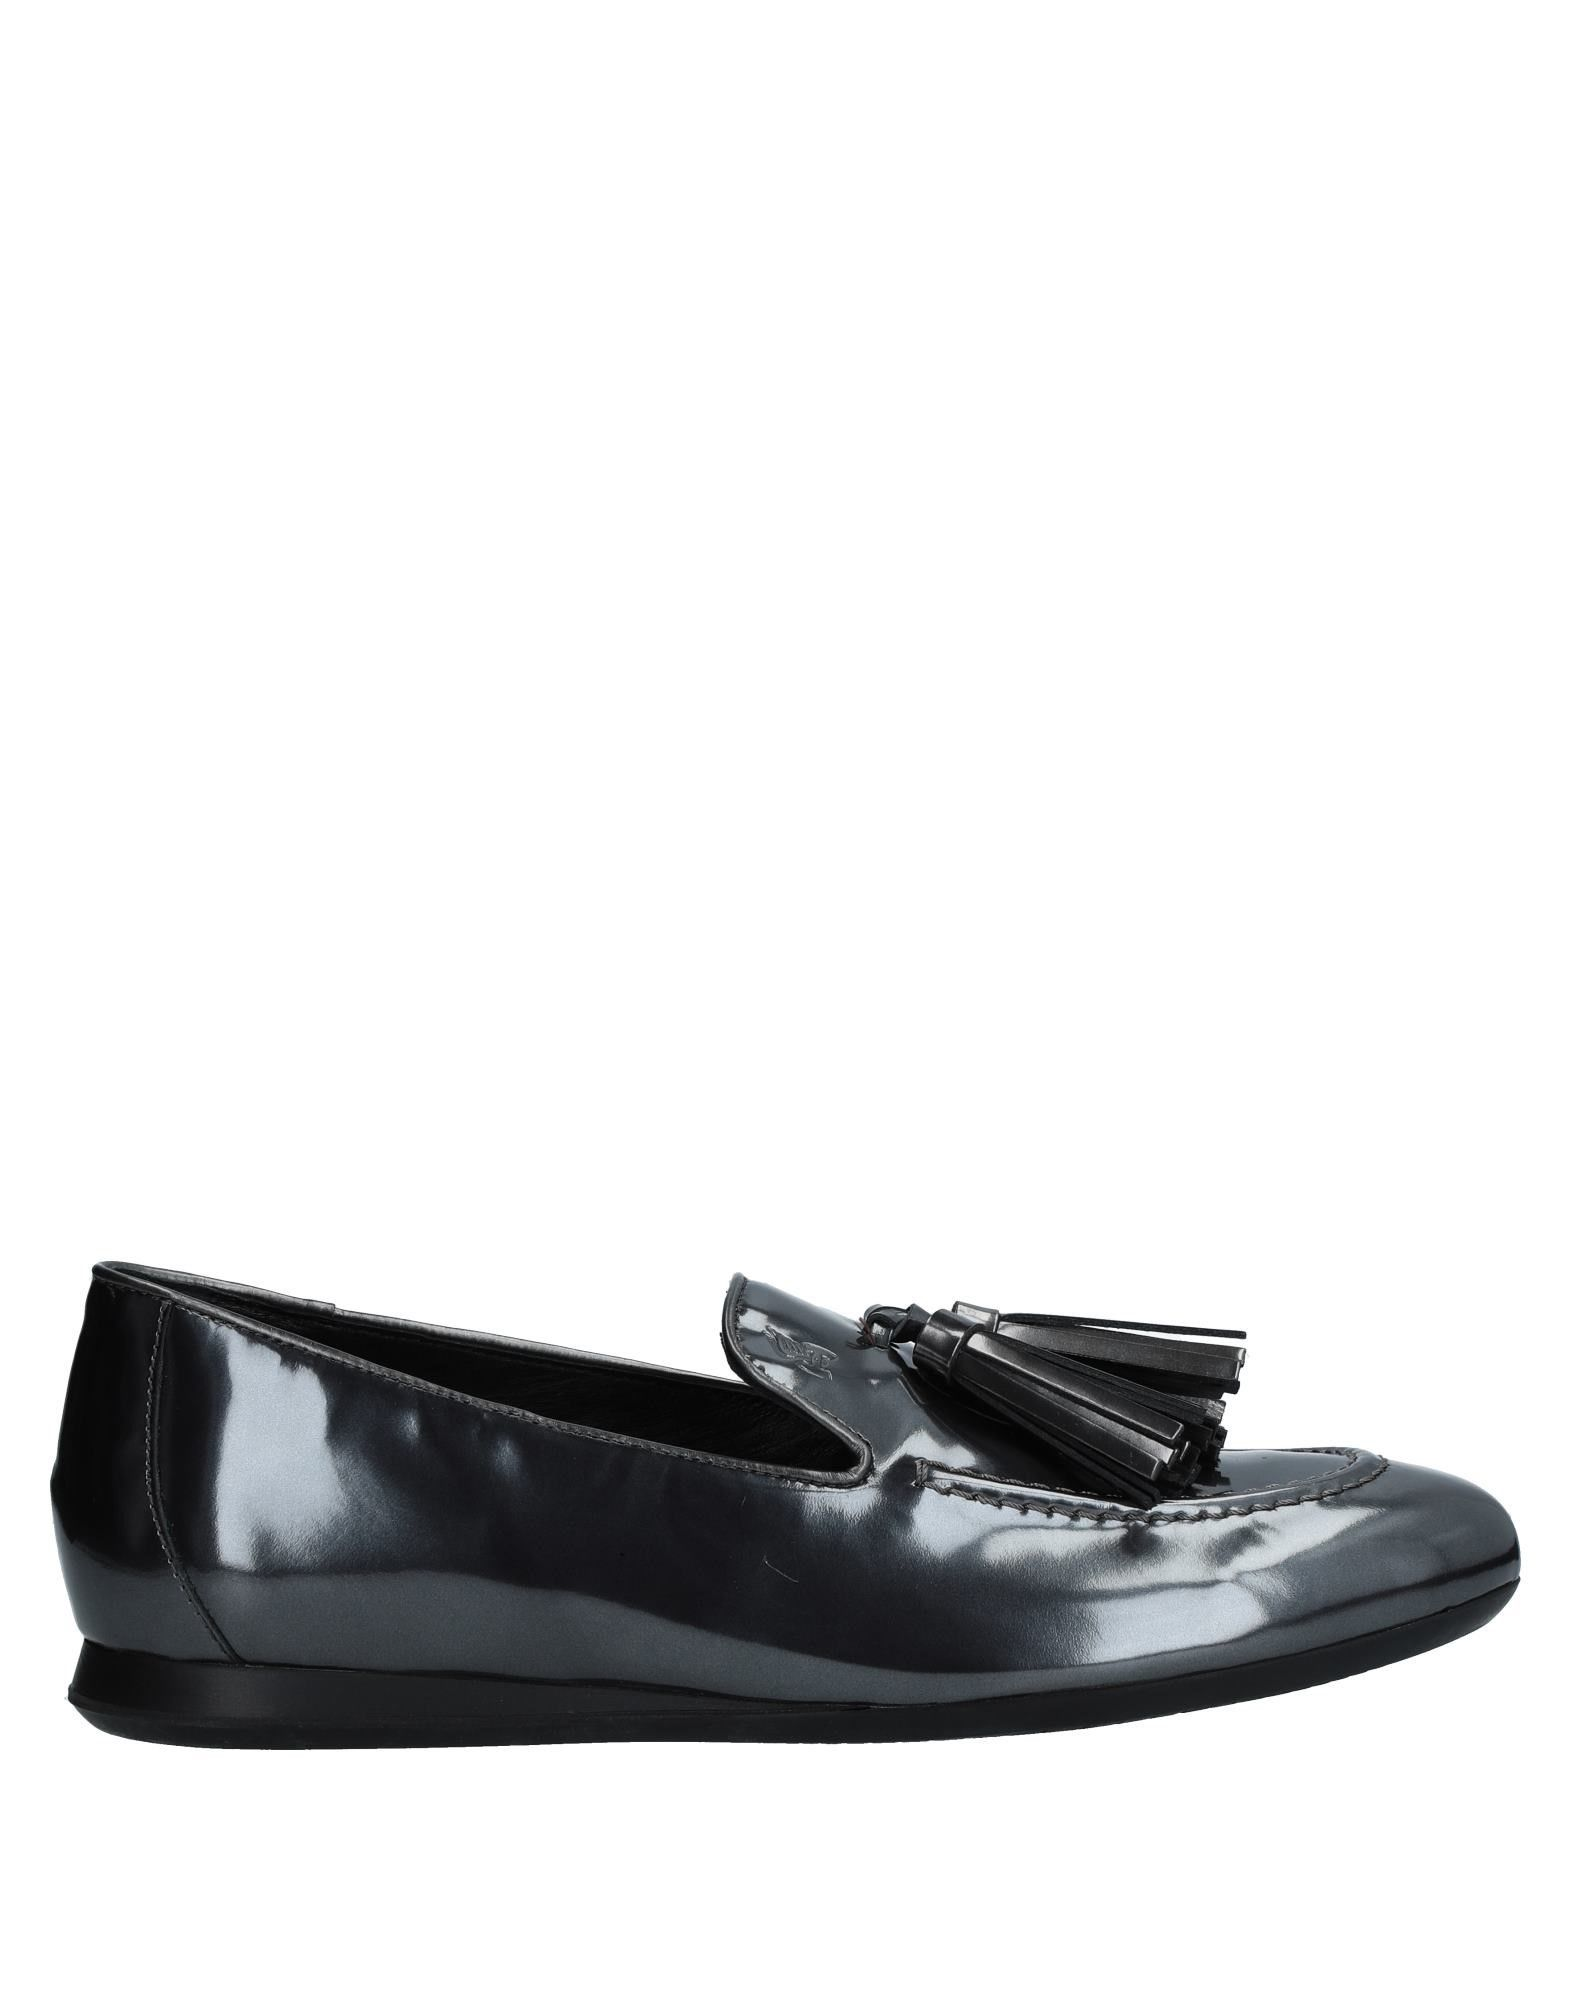 Hogan Mokassins Damen  11540053DFGut aussehende strapazierfähige Schuhe